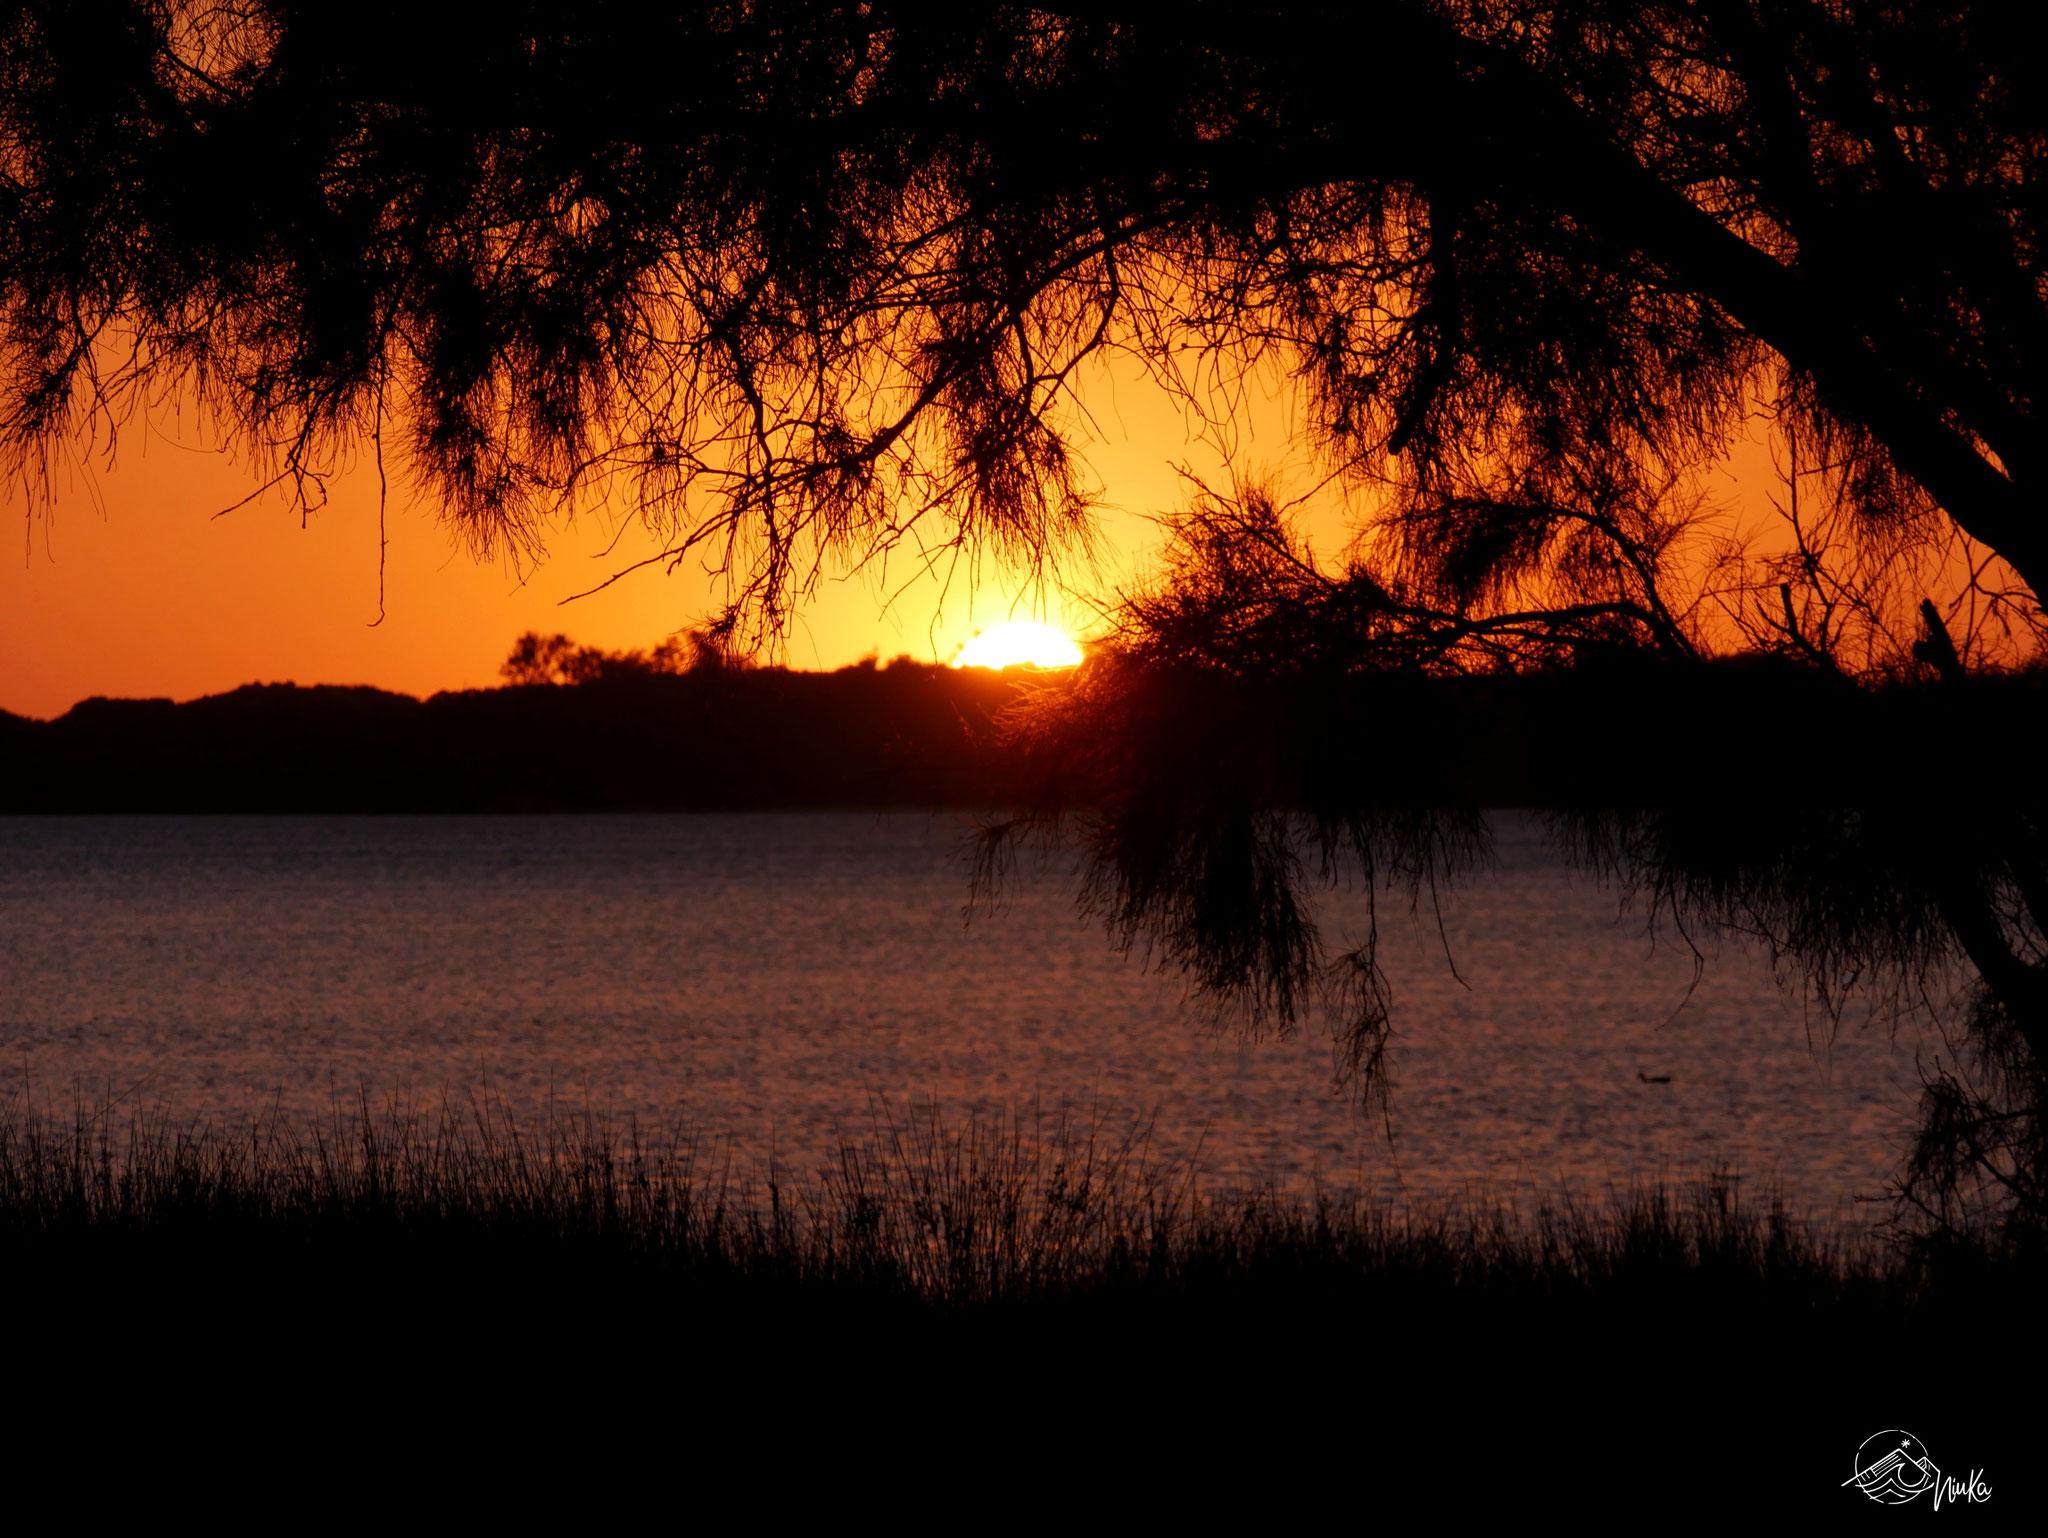 Sonnenuntergang in Australind